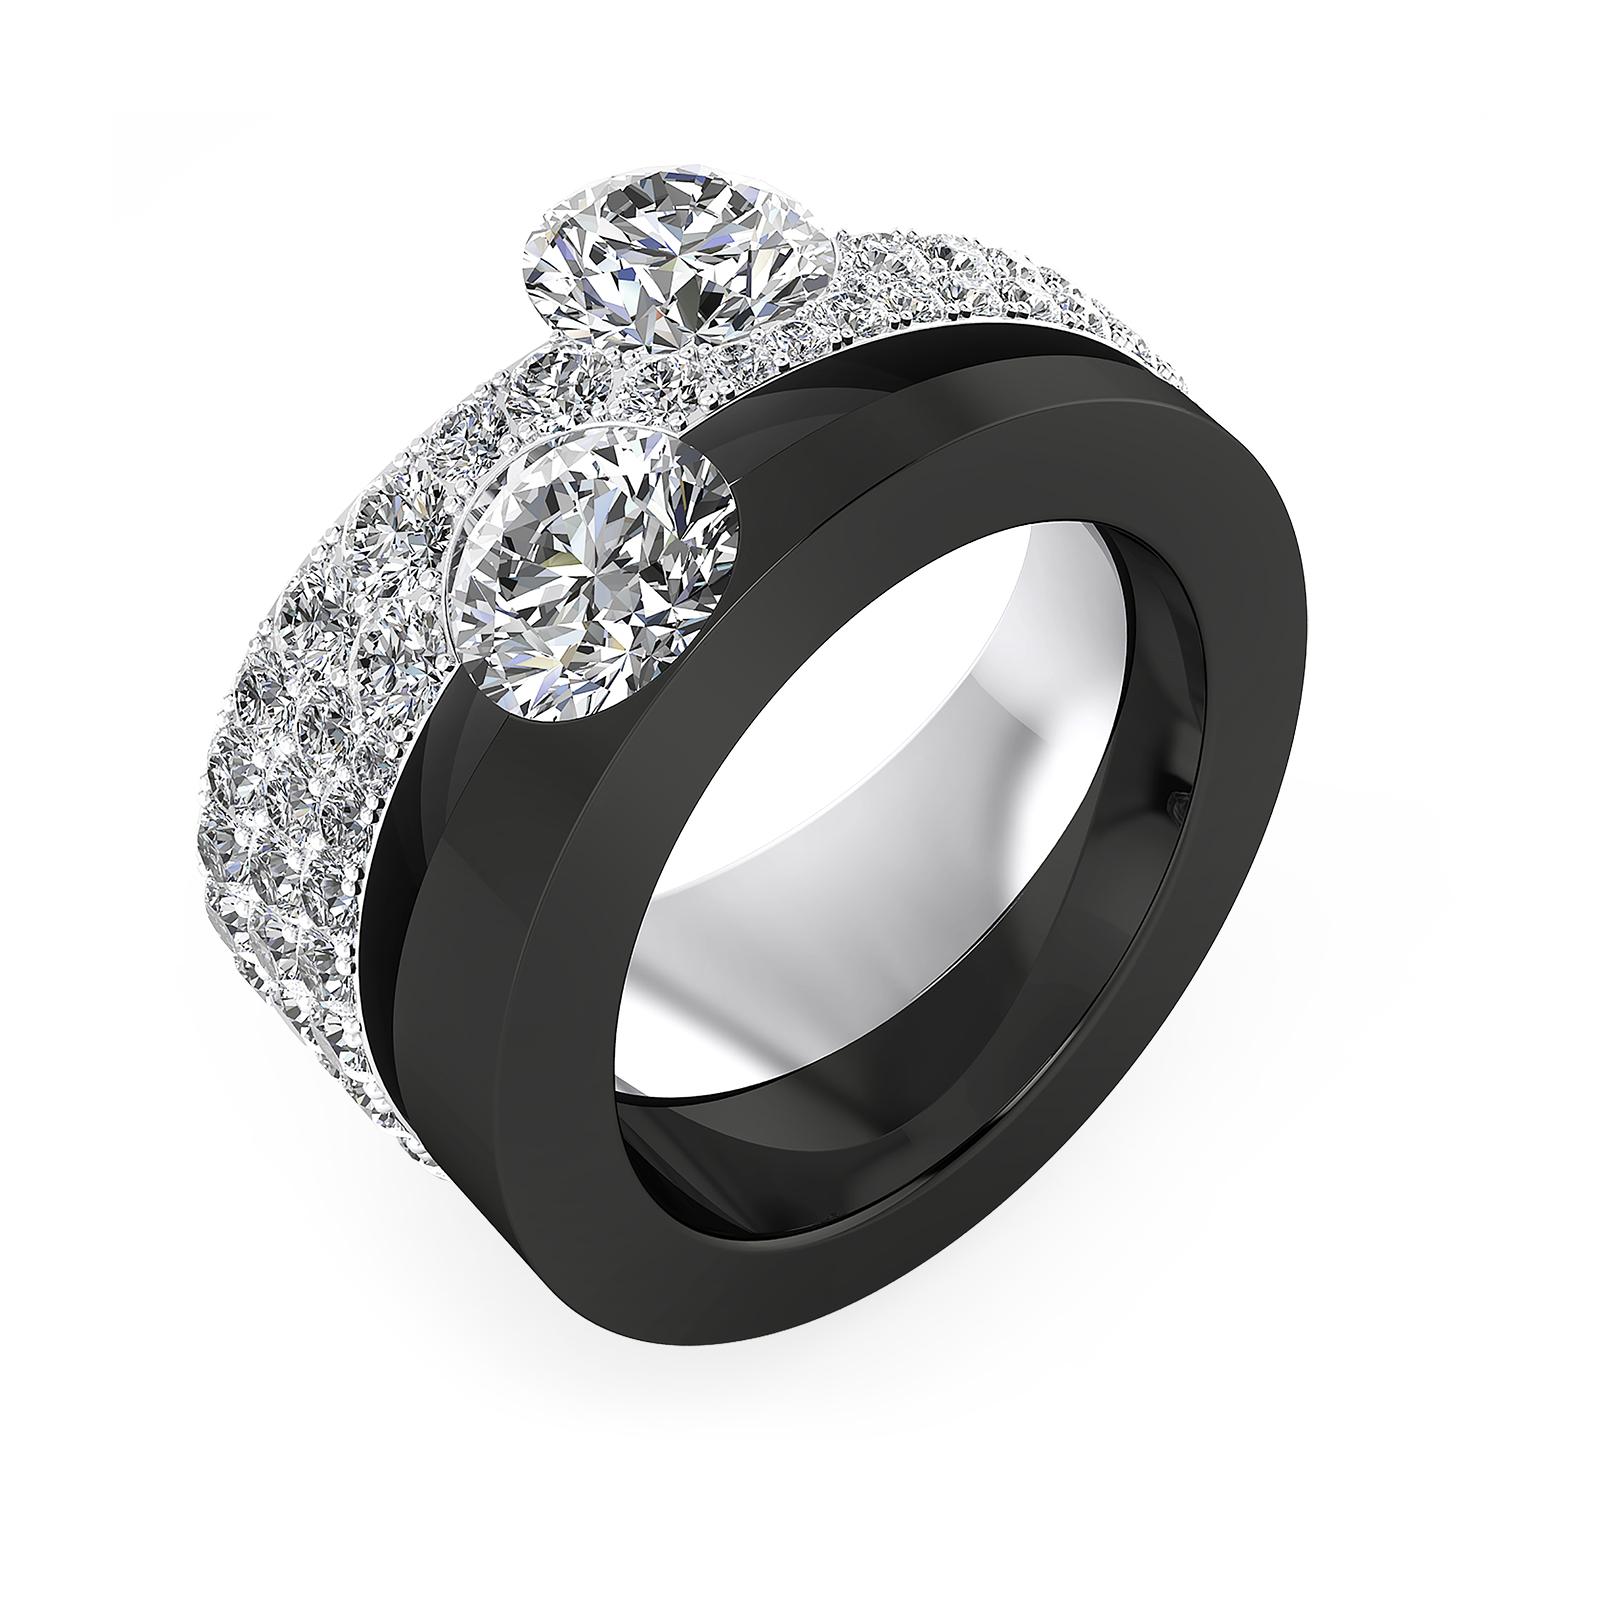 Anells de compromis or blanc amb diamants 2 diamants centrals